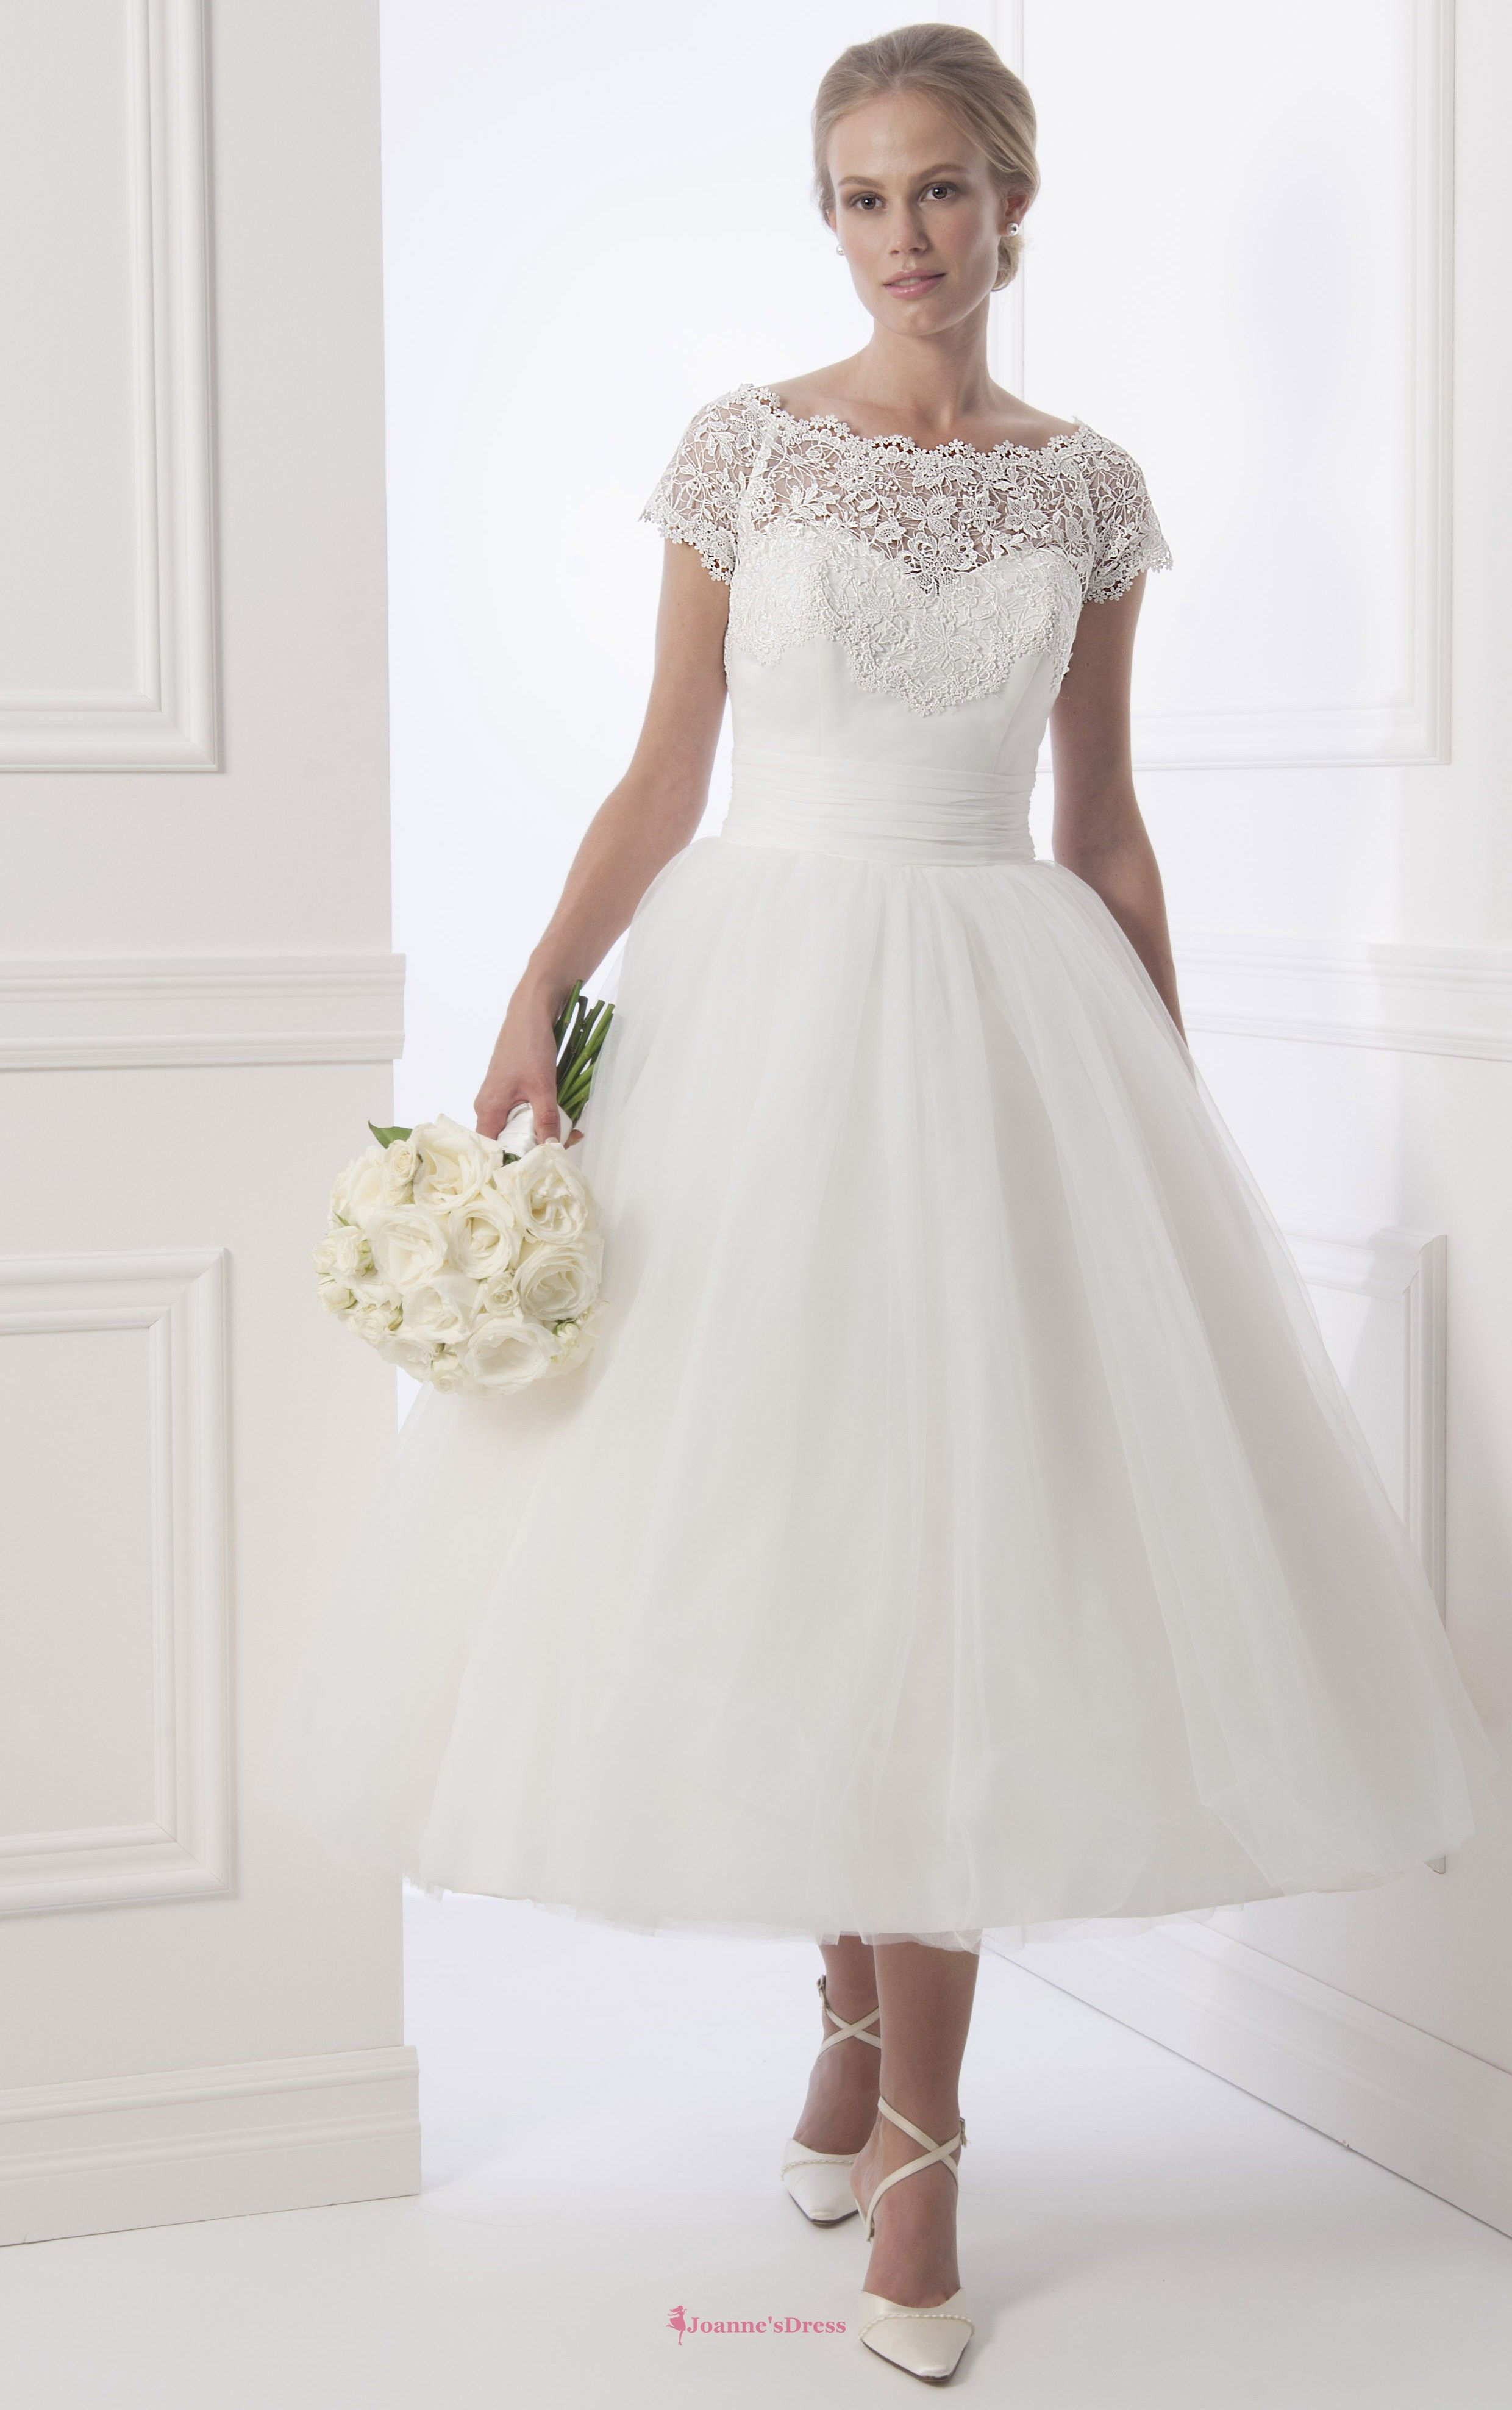 Tea length plus size wedding dresses  Fairytale Bateau Aline Tealength Wedding Dress With Lace  Wedding